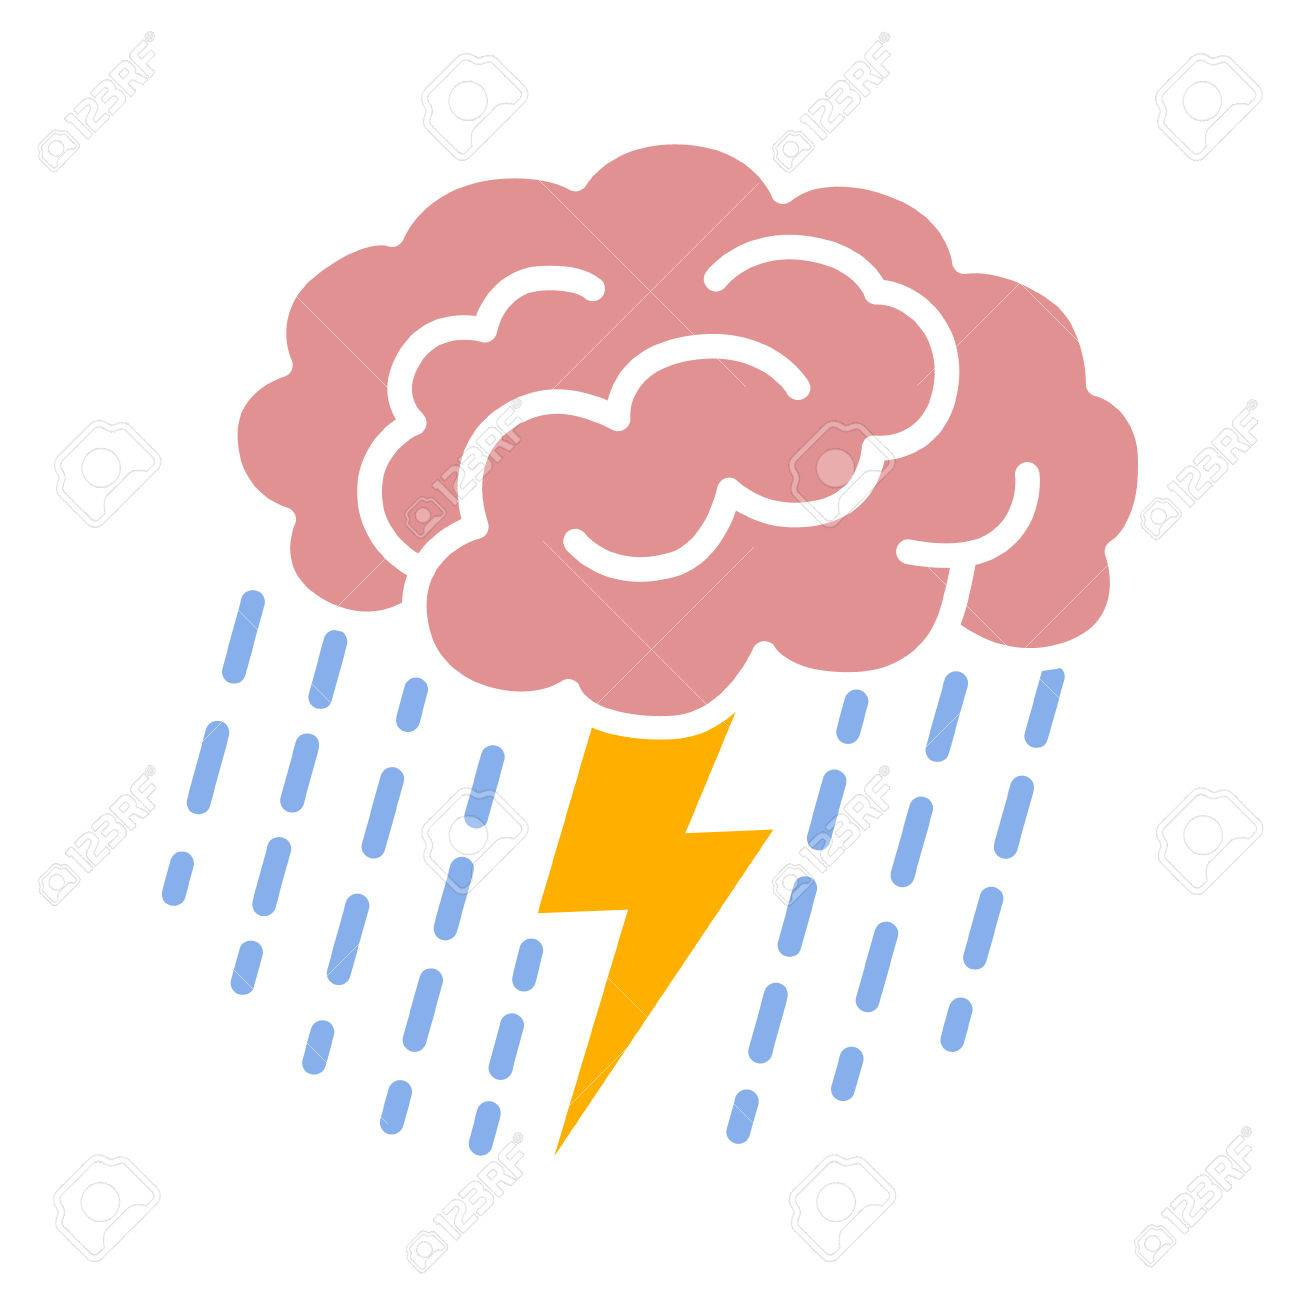 brain brainstorm brainstorming with lightning bolt and rain rh 123rf com brainstorming clipart brainstorming session clipart